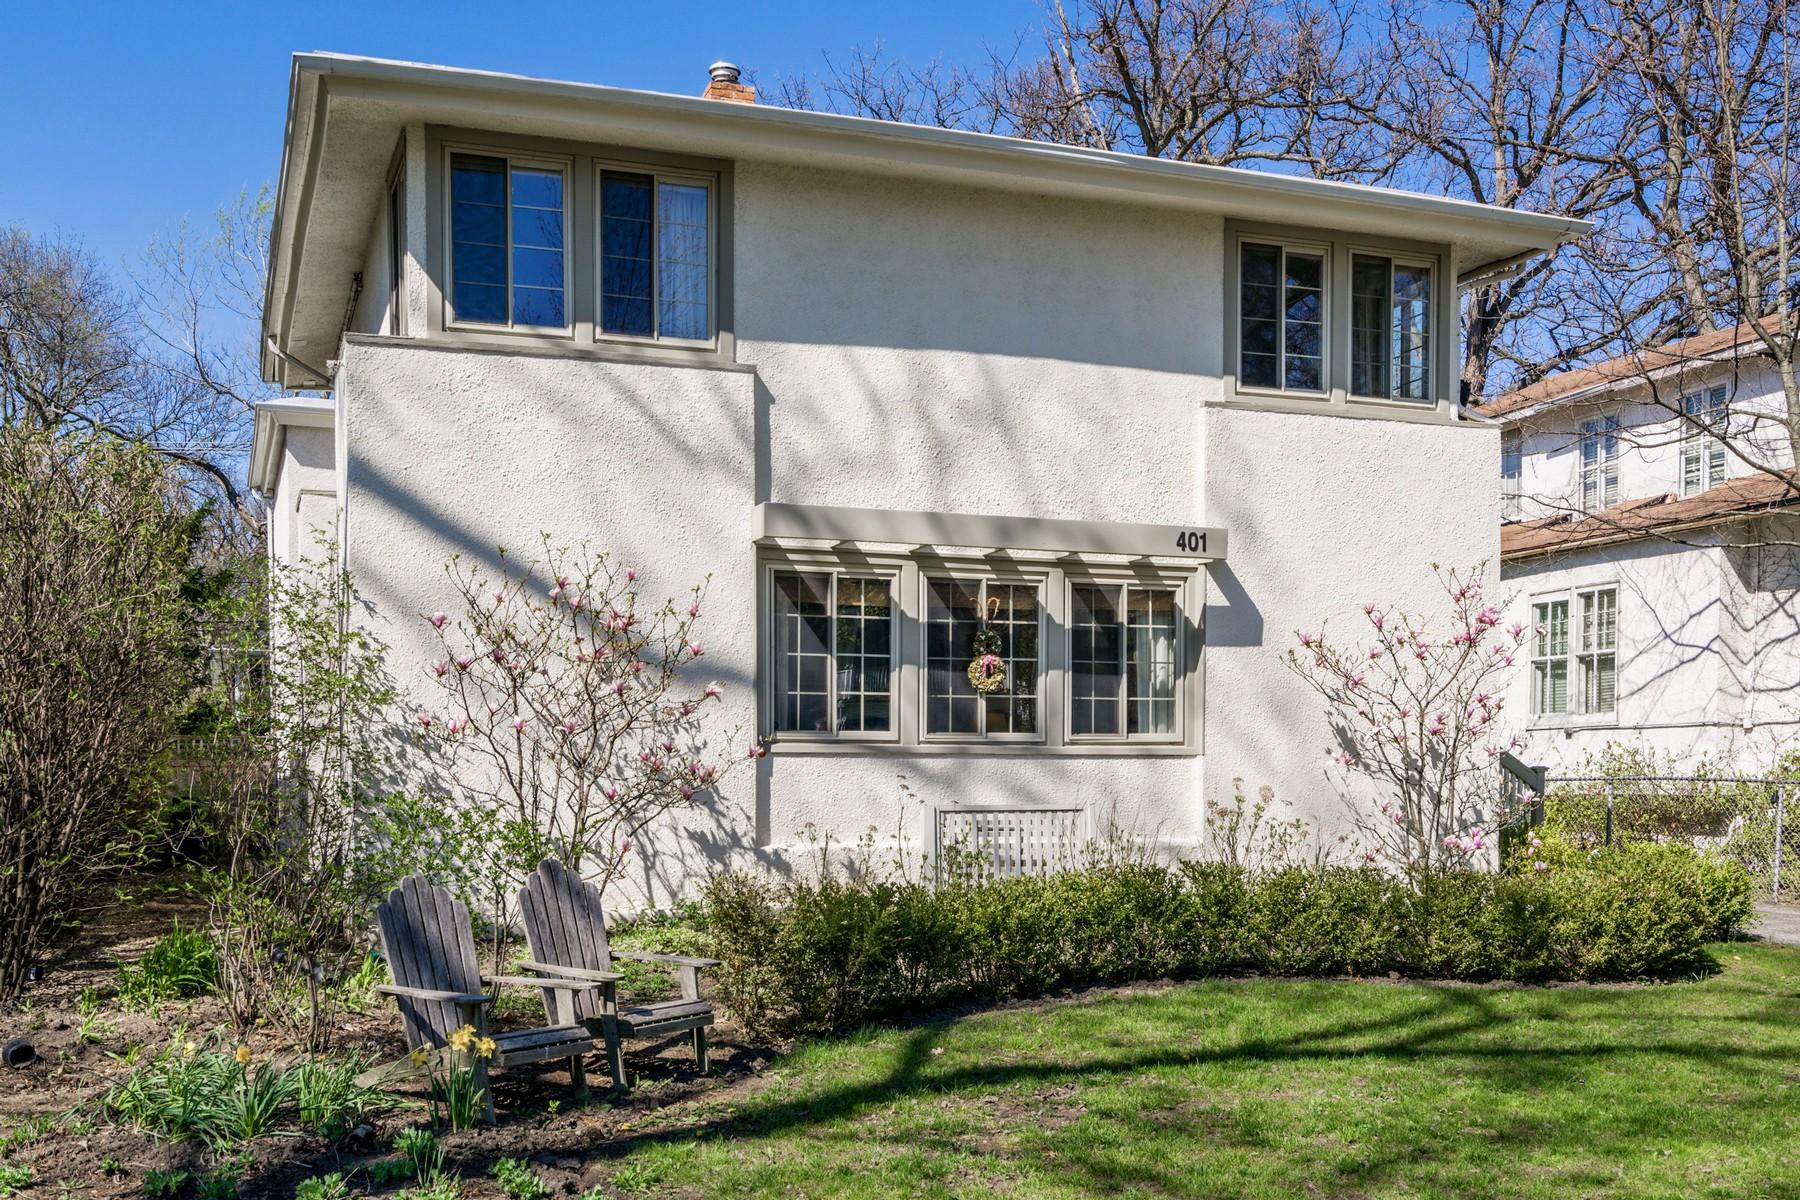 Moradia para Venda às Classic Prairie Style Home 401 Woodlawn Avenue Glencoe, Illinois, 60022 Estados Unidos